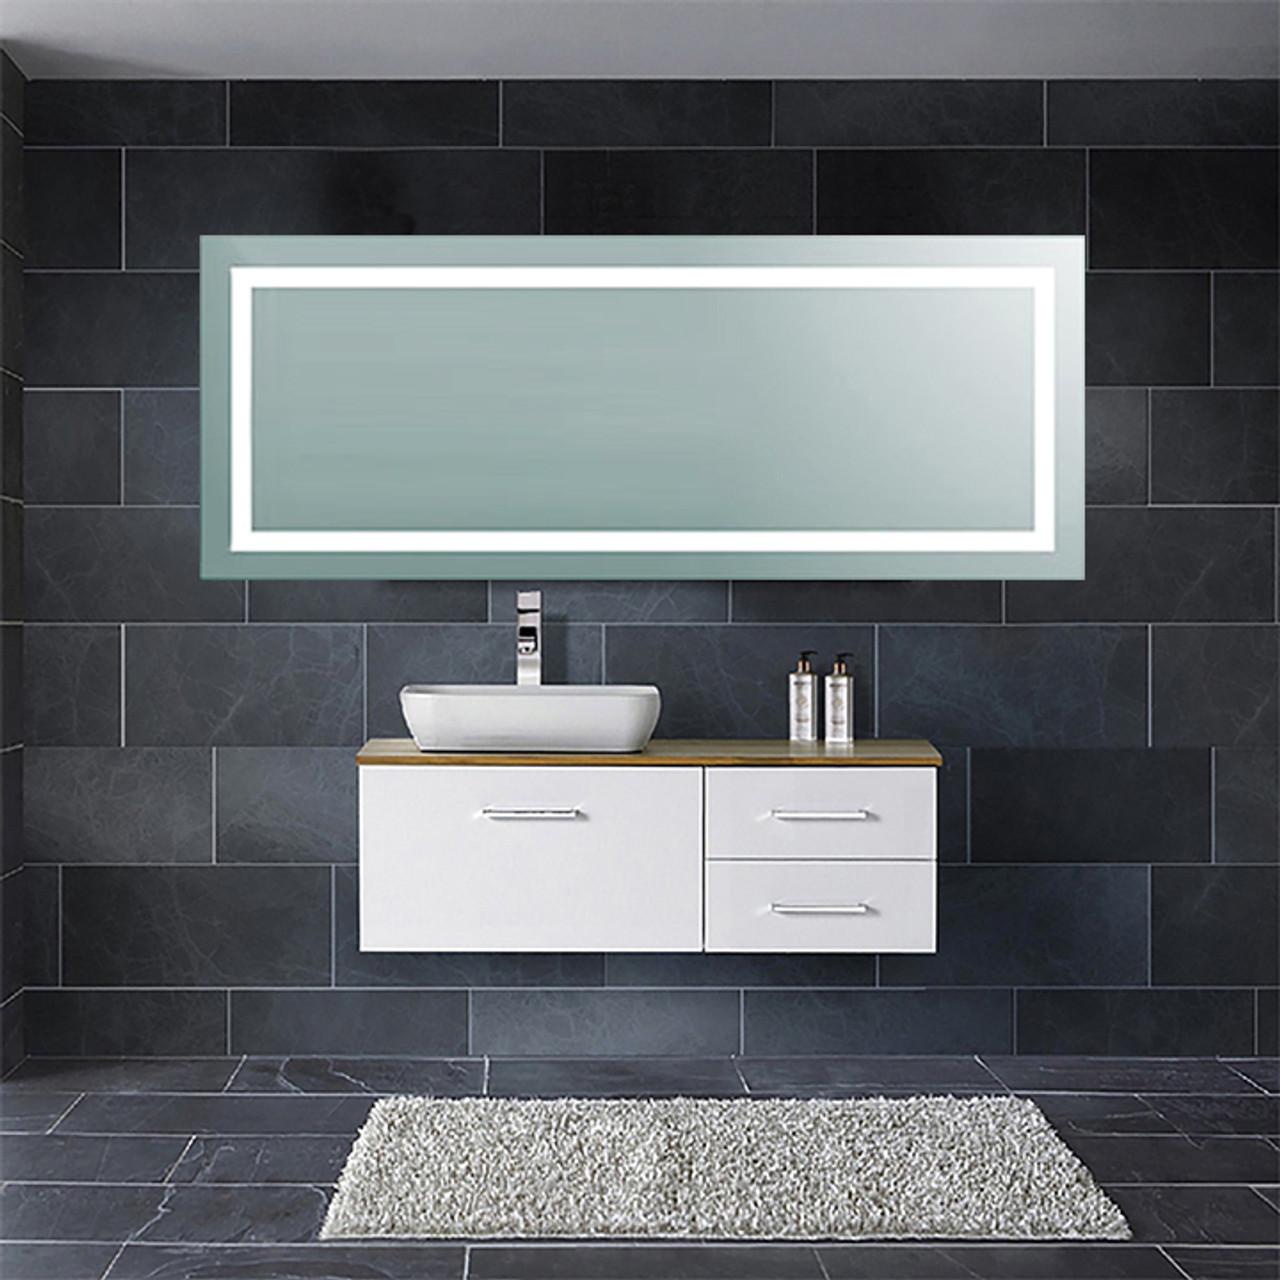 LED Backlit Mirror Light 24x60in. – 80W